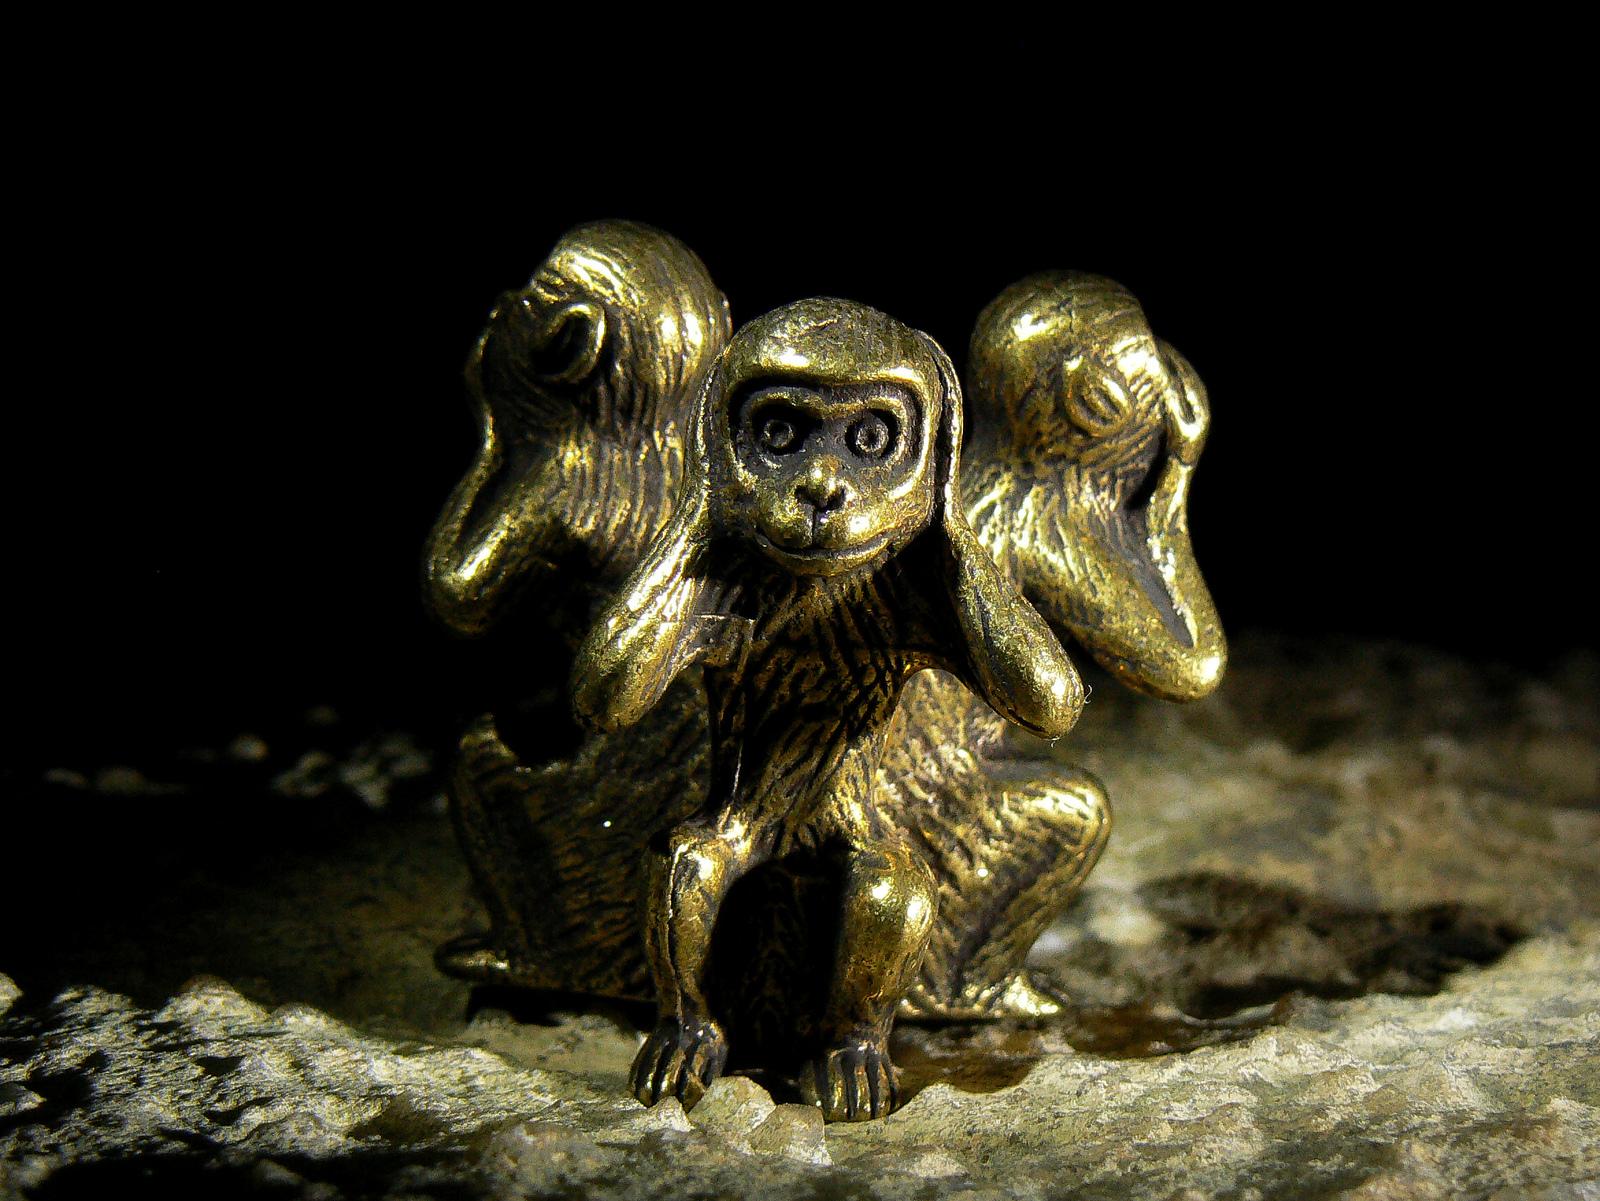 HANUMAN SPIRIT of VICTORY 3 Wise Monkeys Antique Bronze Statuette izida haunted - $373.00